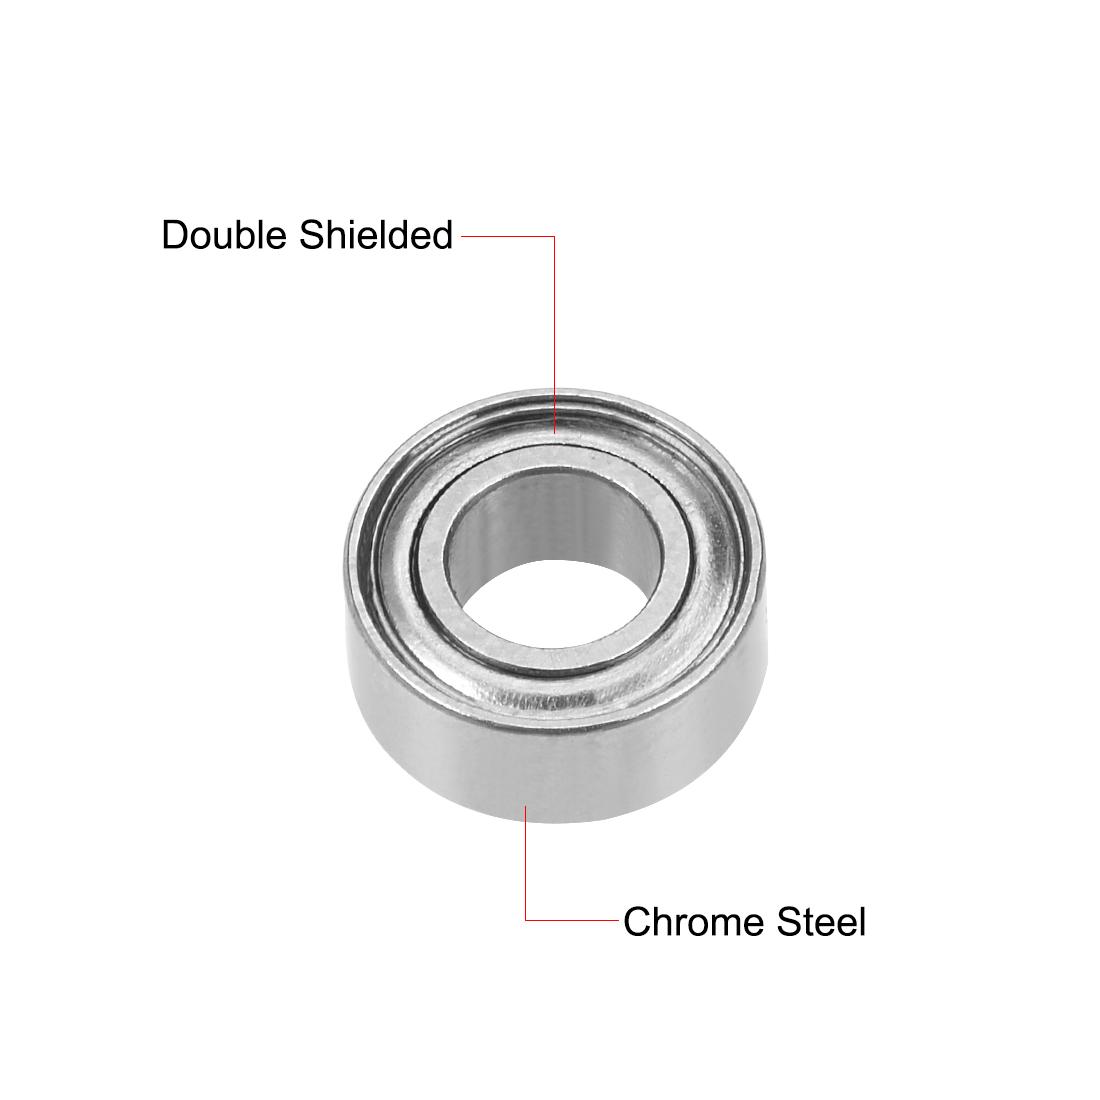 "R155ZZ Deep Groove Ball Bearing 5/32""x5/16""x1/8"" Shielded GCr15 Bearings 2pcs - image 3 of 4"